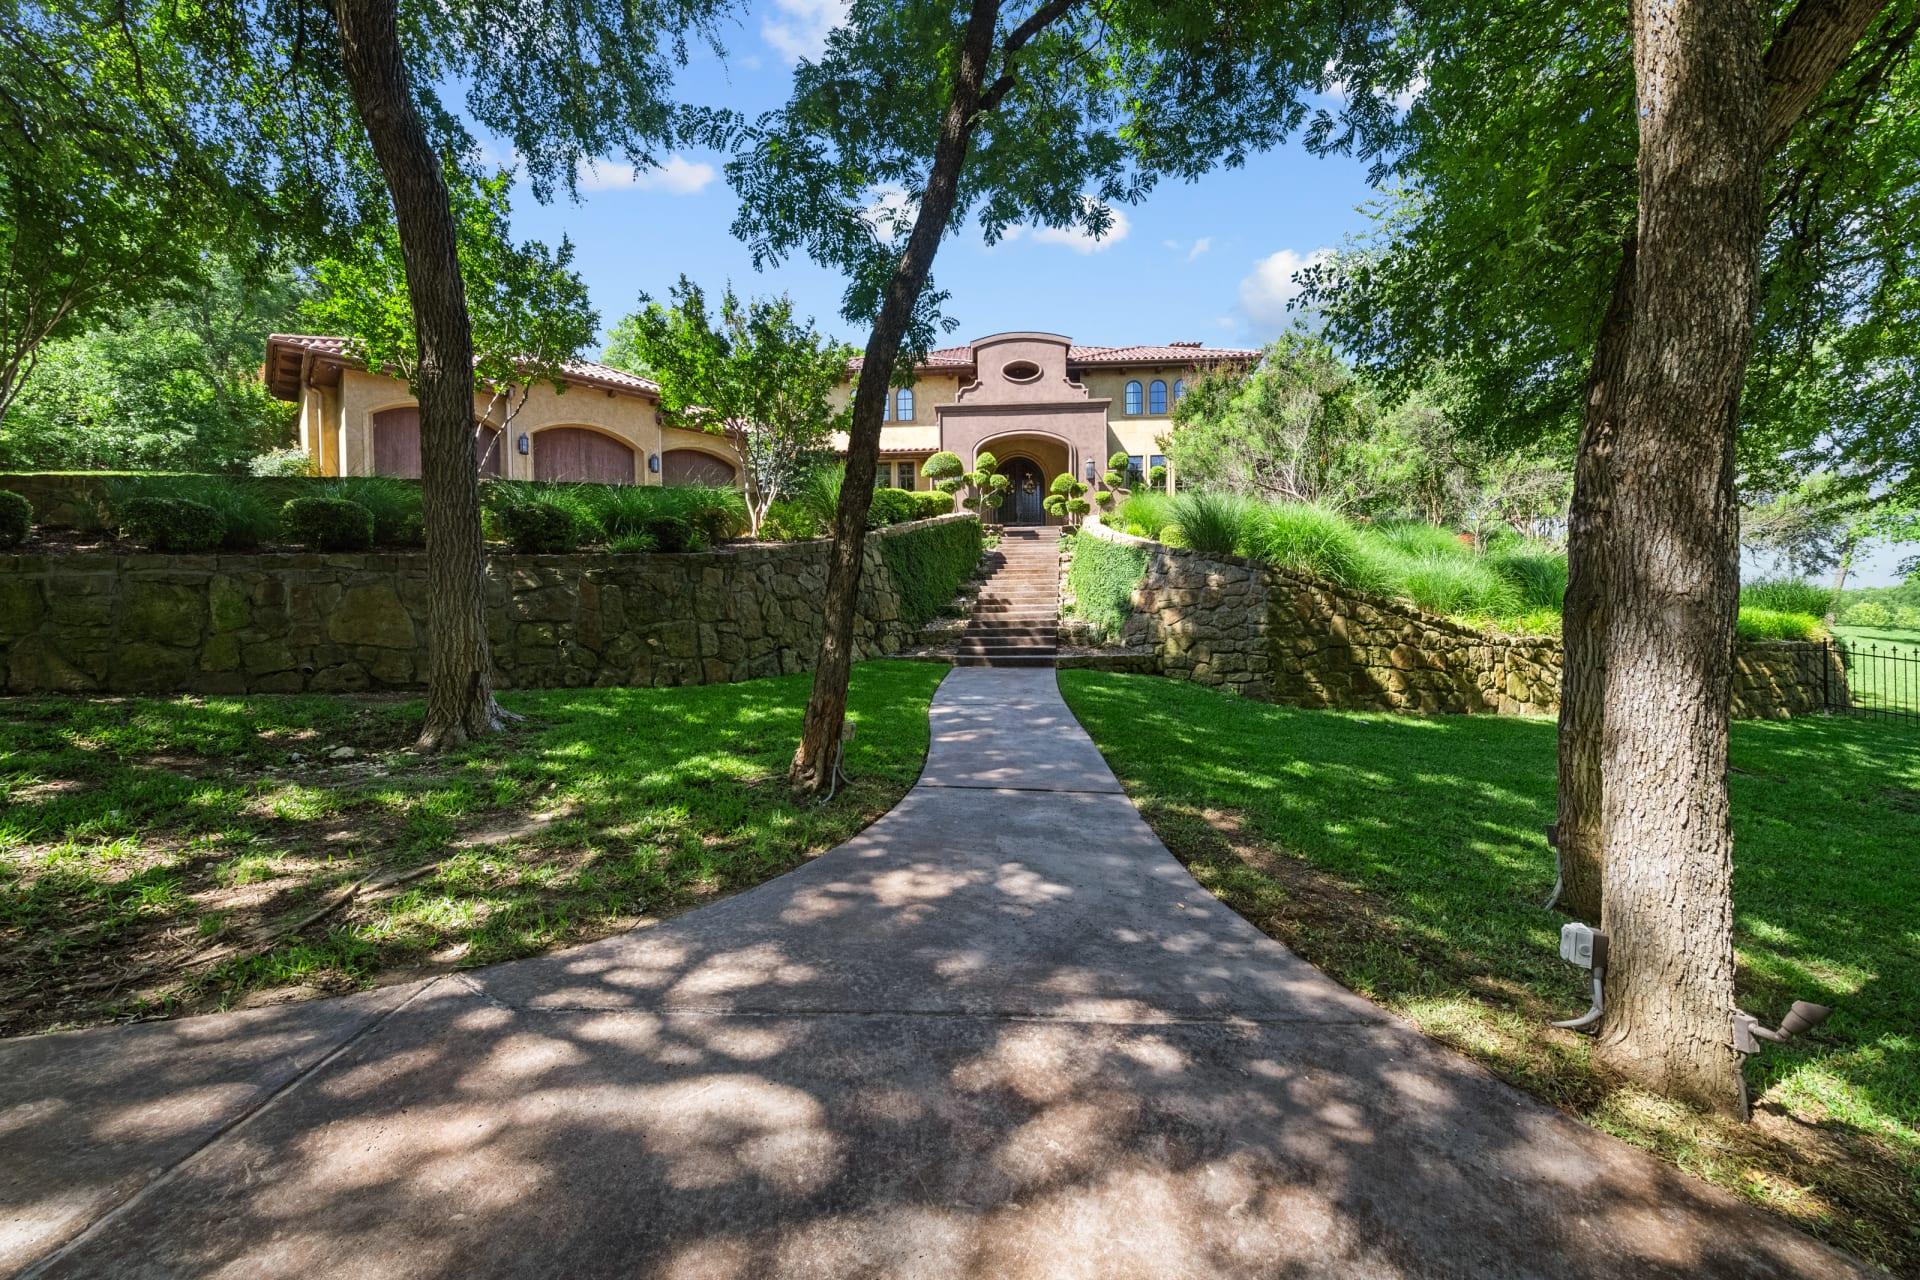 9473 Sagrada Park  photo